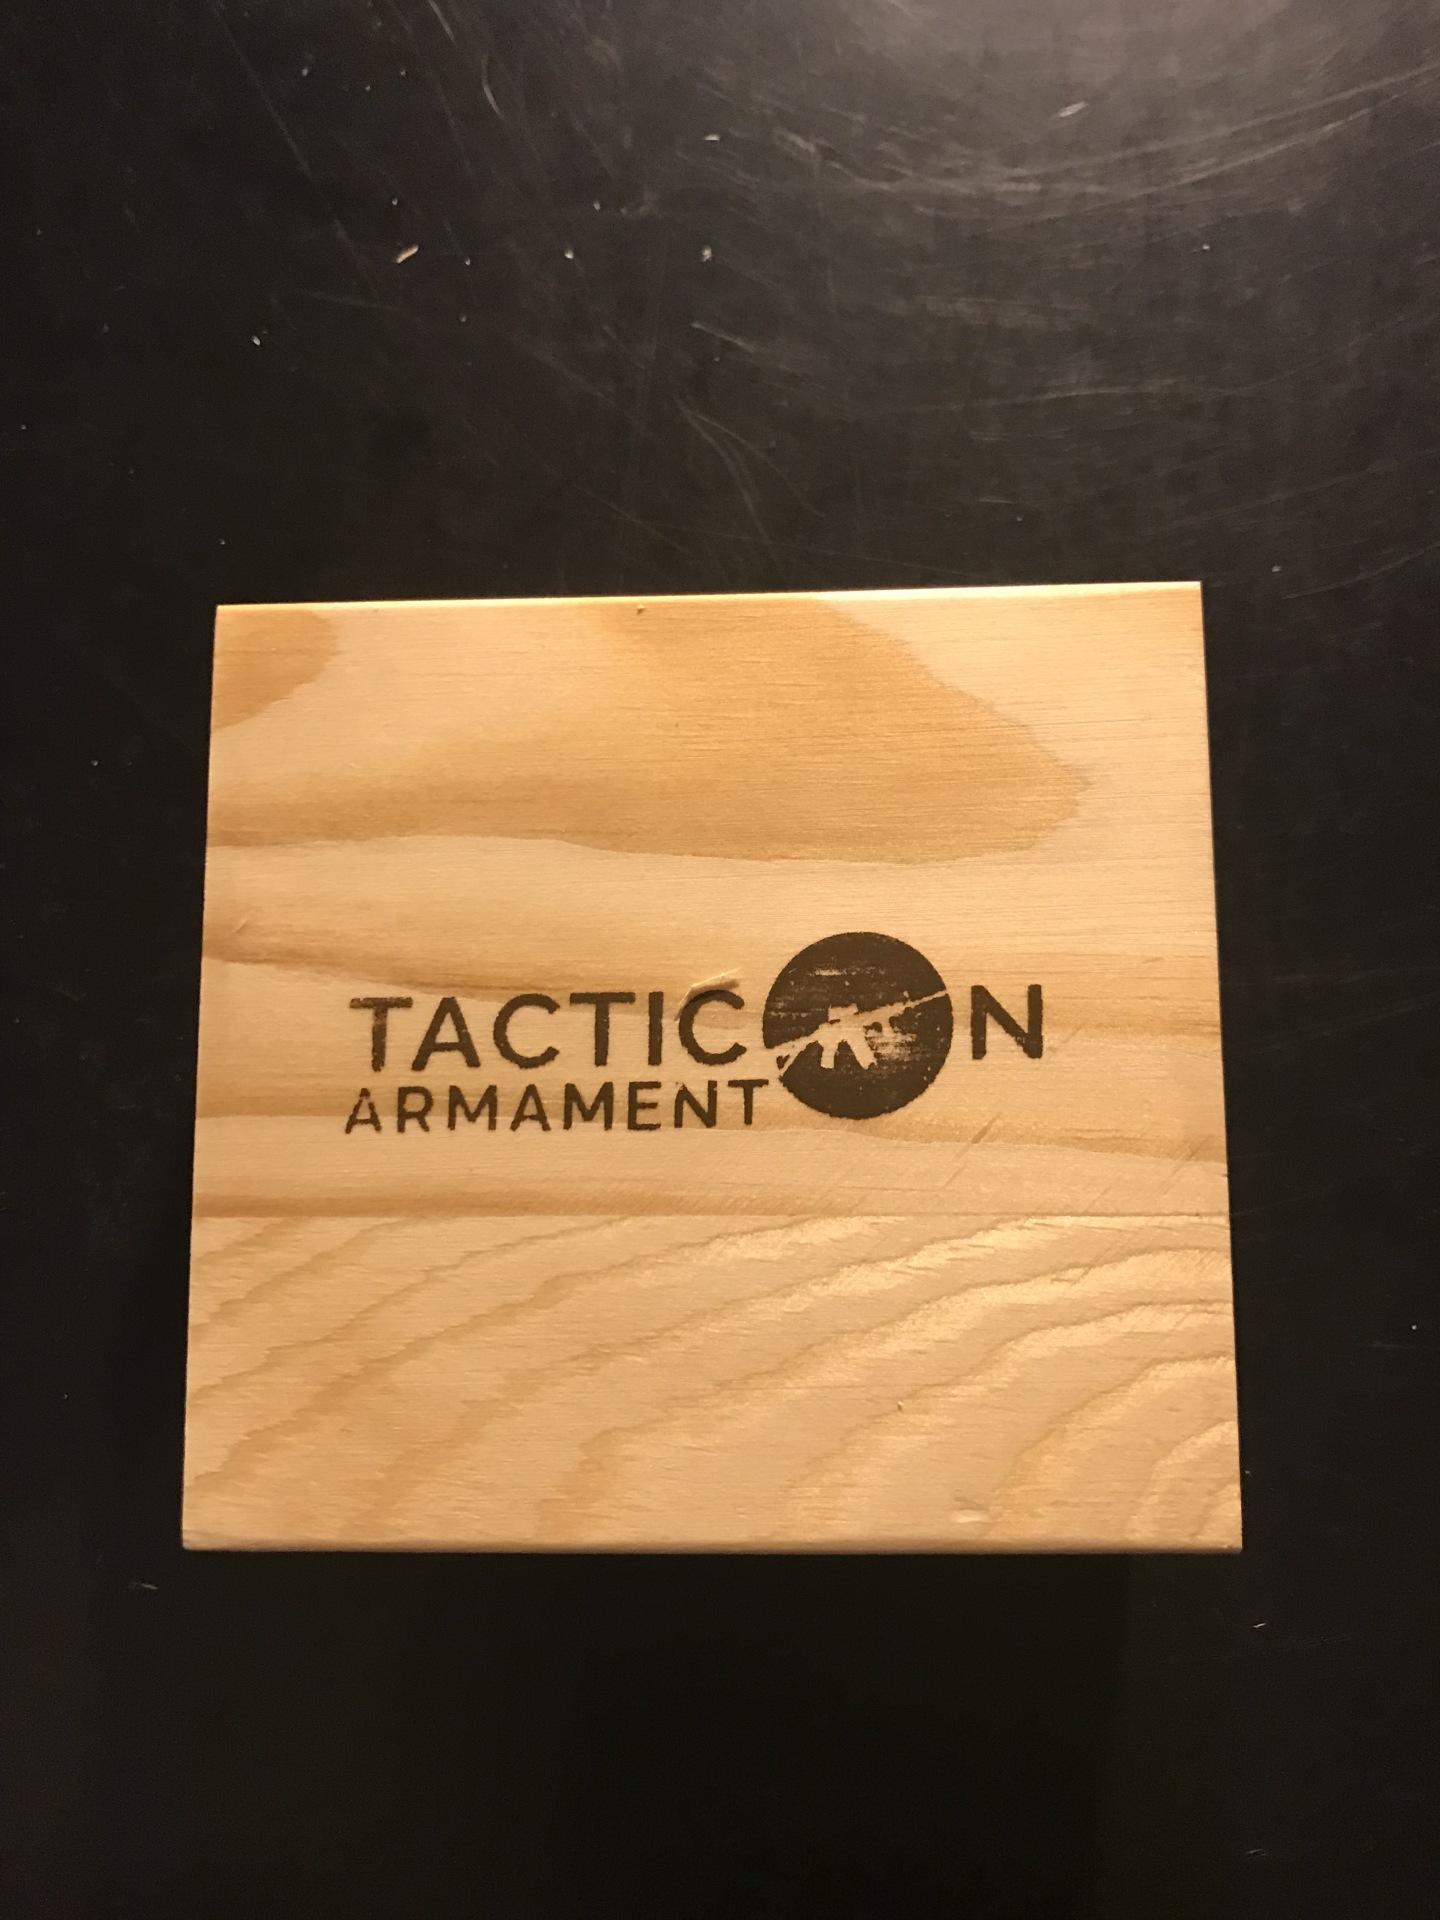 Tacticon Flip up Iron Sights $35  SALE!  $30!!!